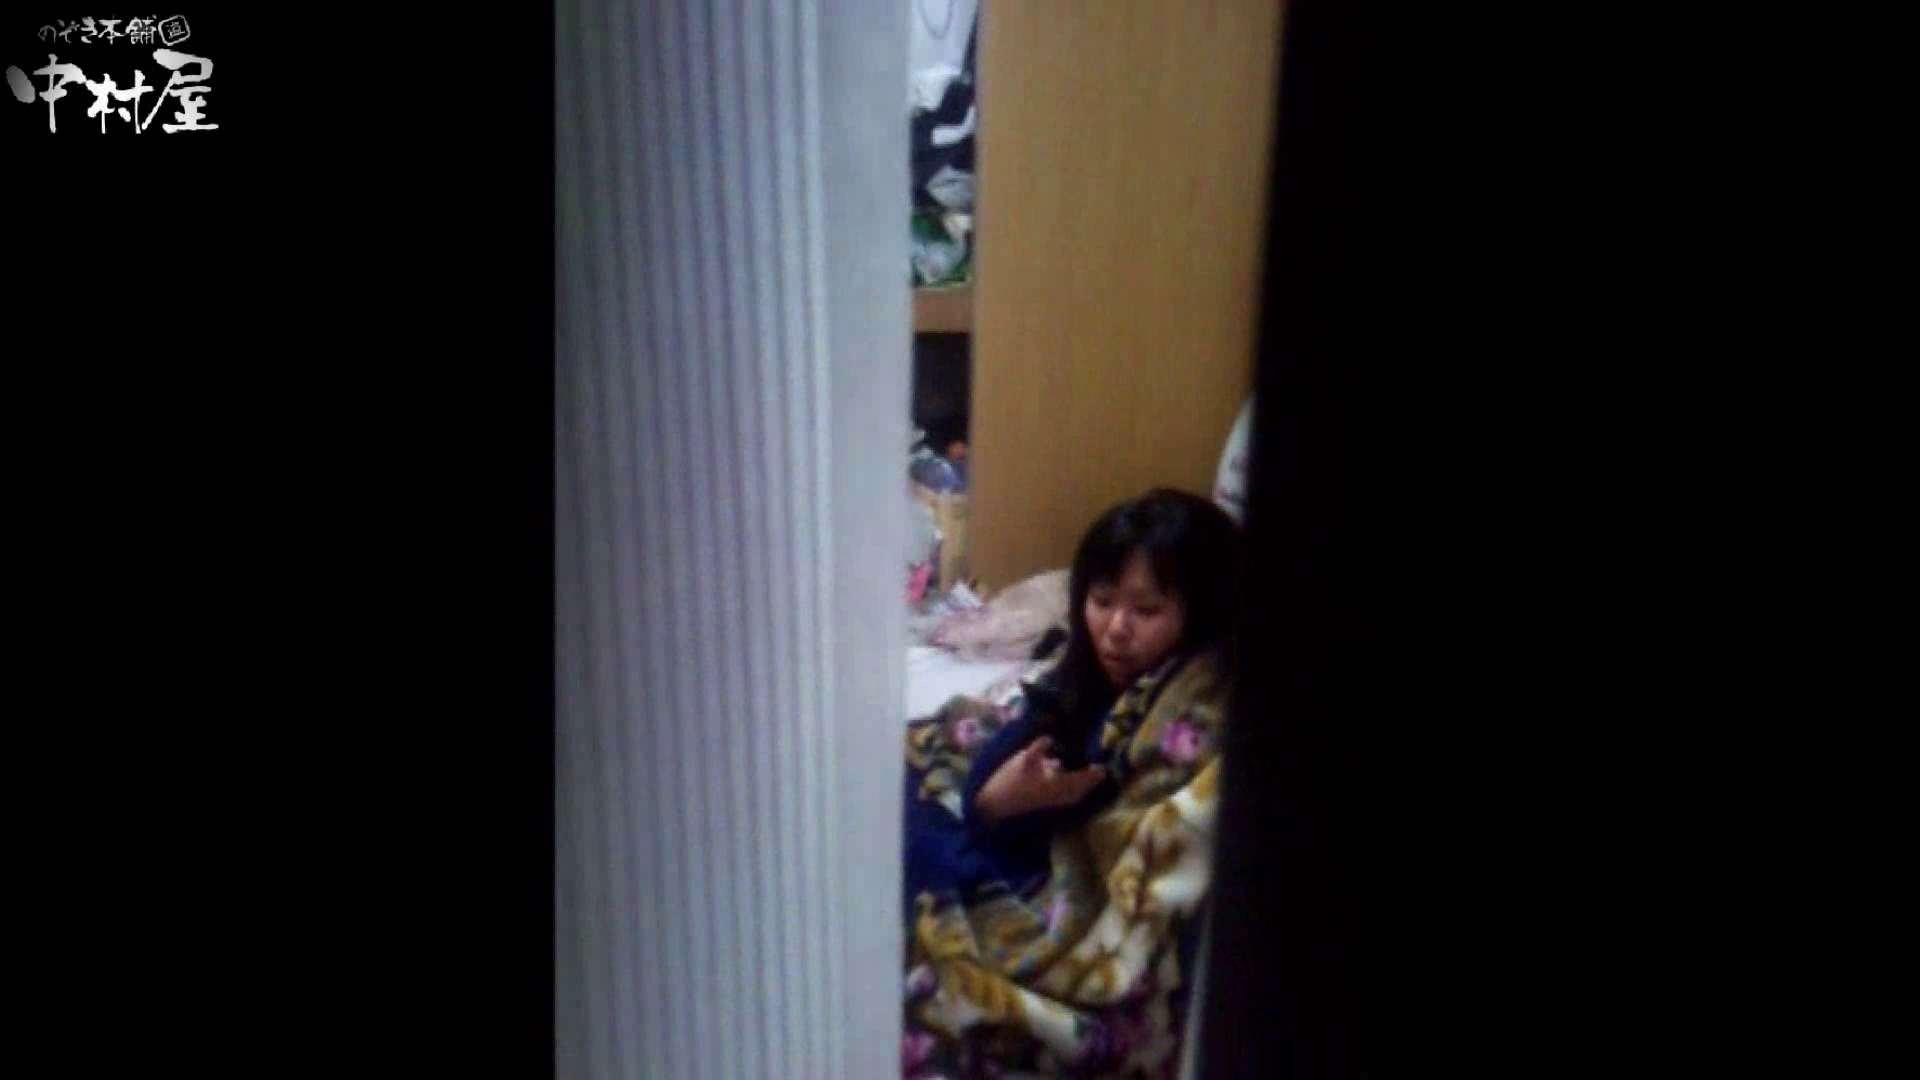 民家風呂専門盗撮師の超危険映像 vol.012 股間 セックス画像 10pic 10